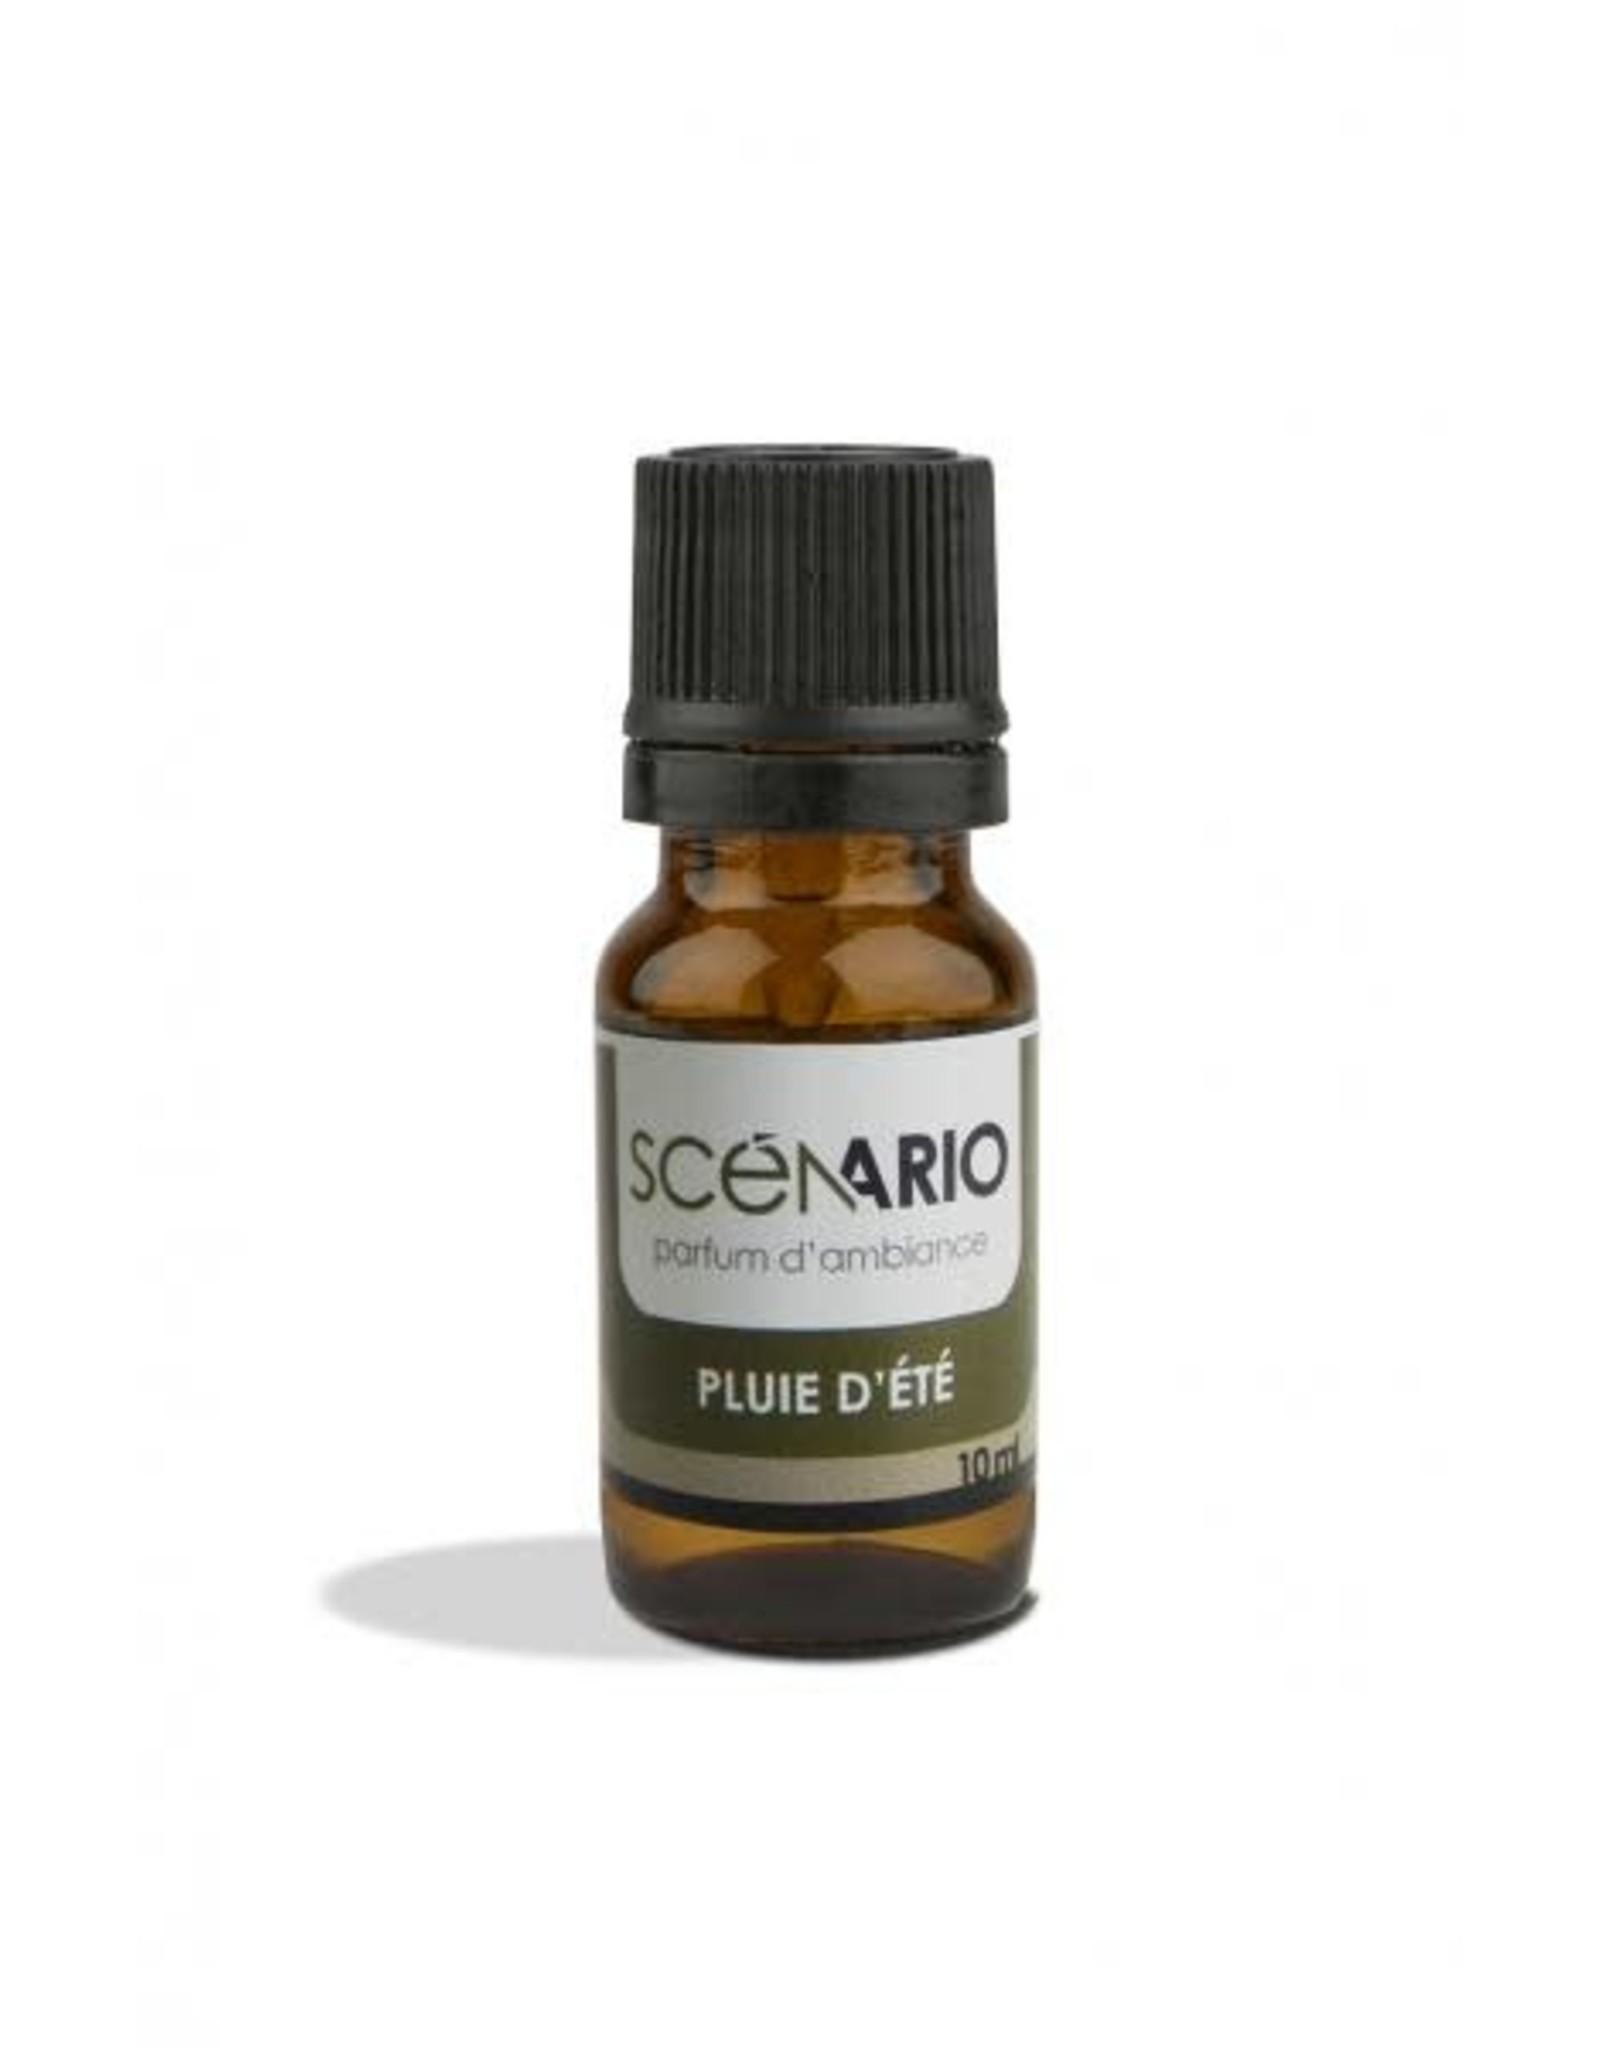 Sphere Pure Essential Oil 10ml